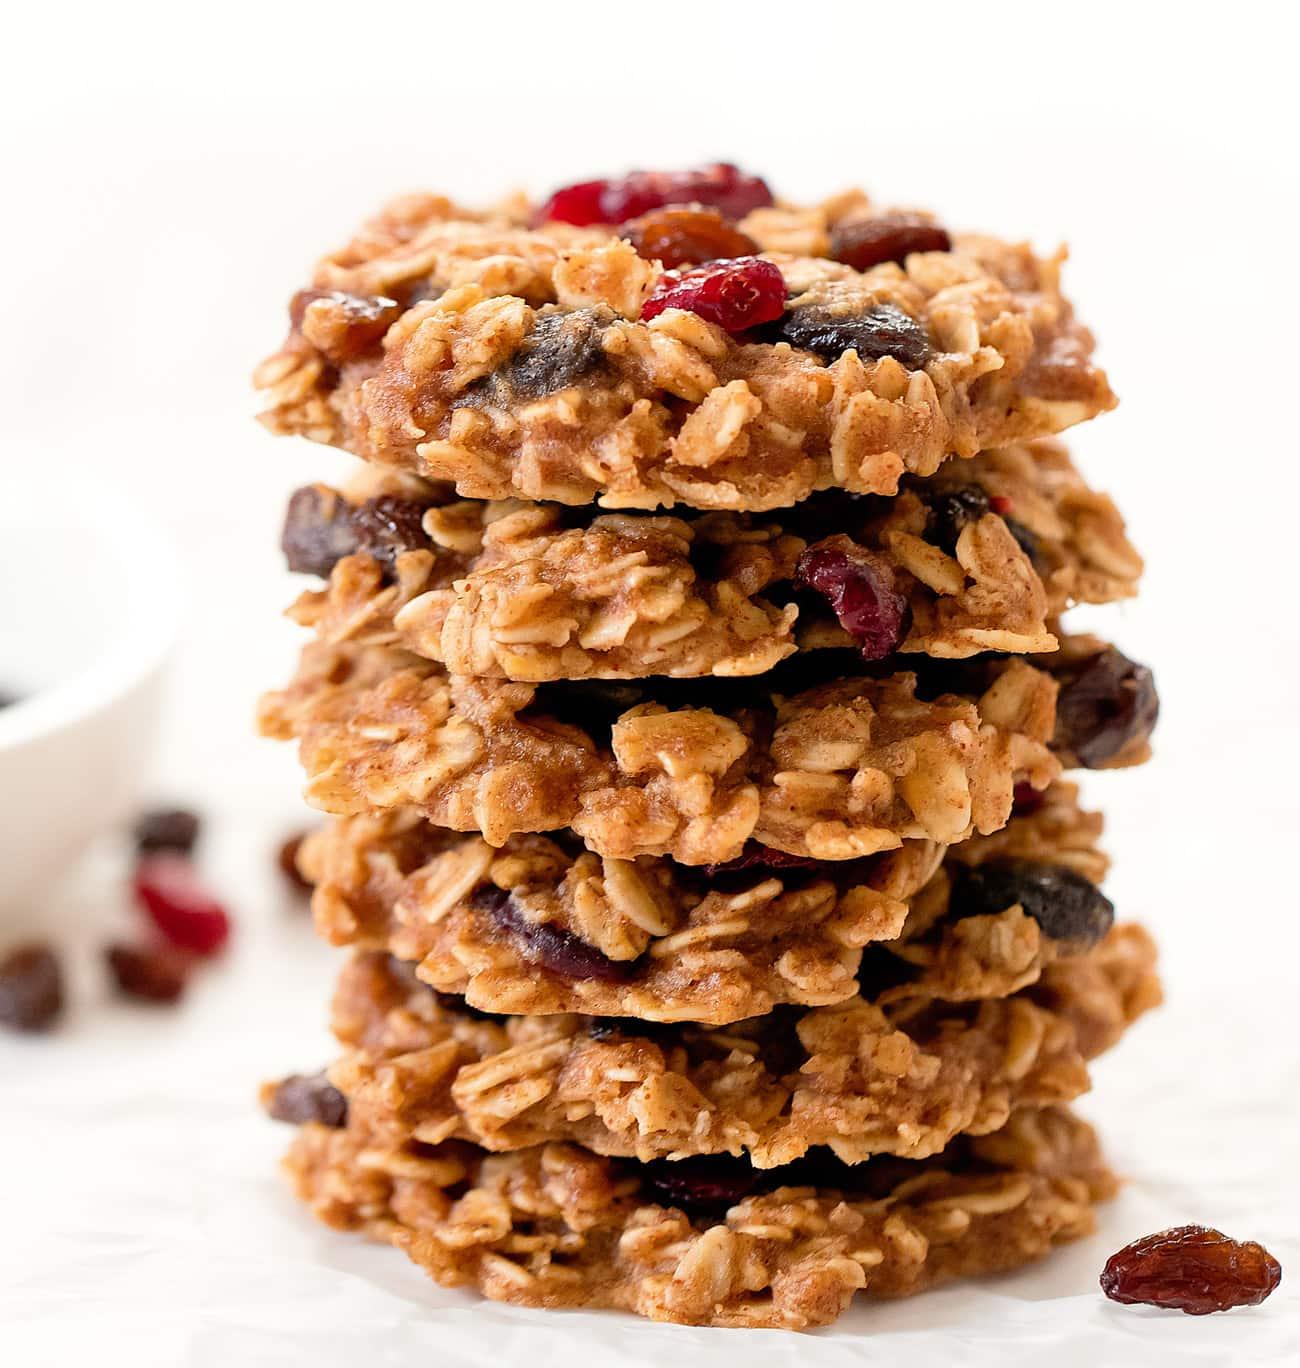 Healthy Oatmeal Raisin Cookies No Eggs Flour Butter Or Refined Sugar Kirbie S Cravings